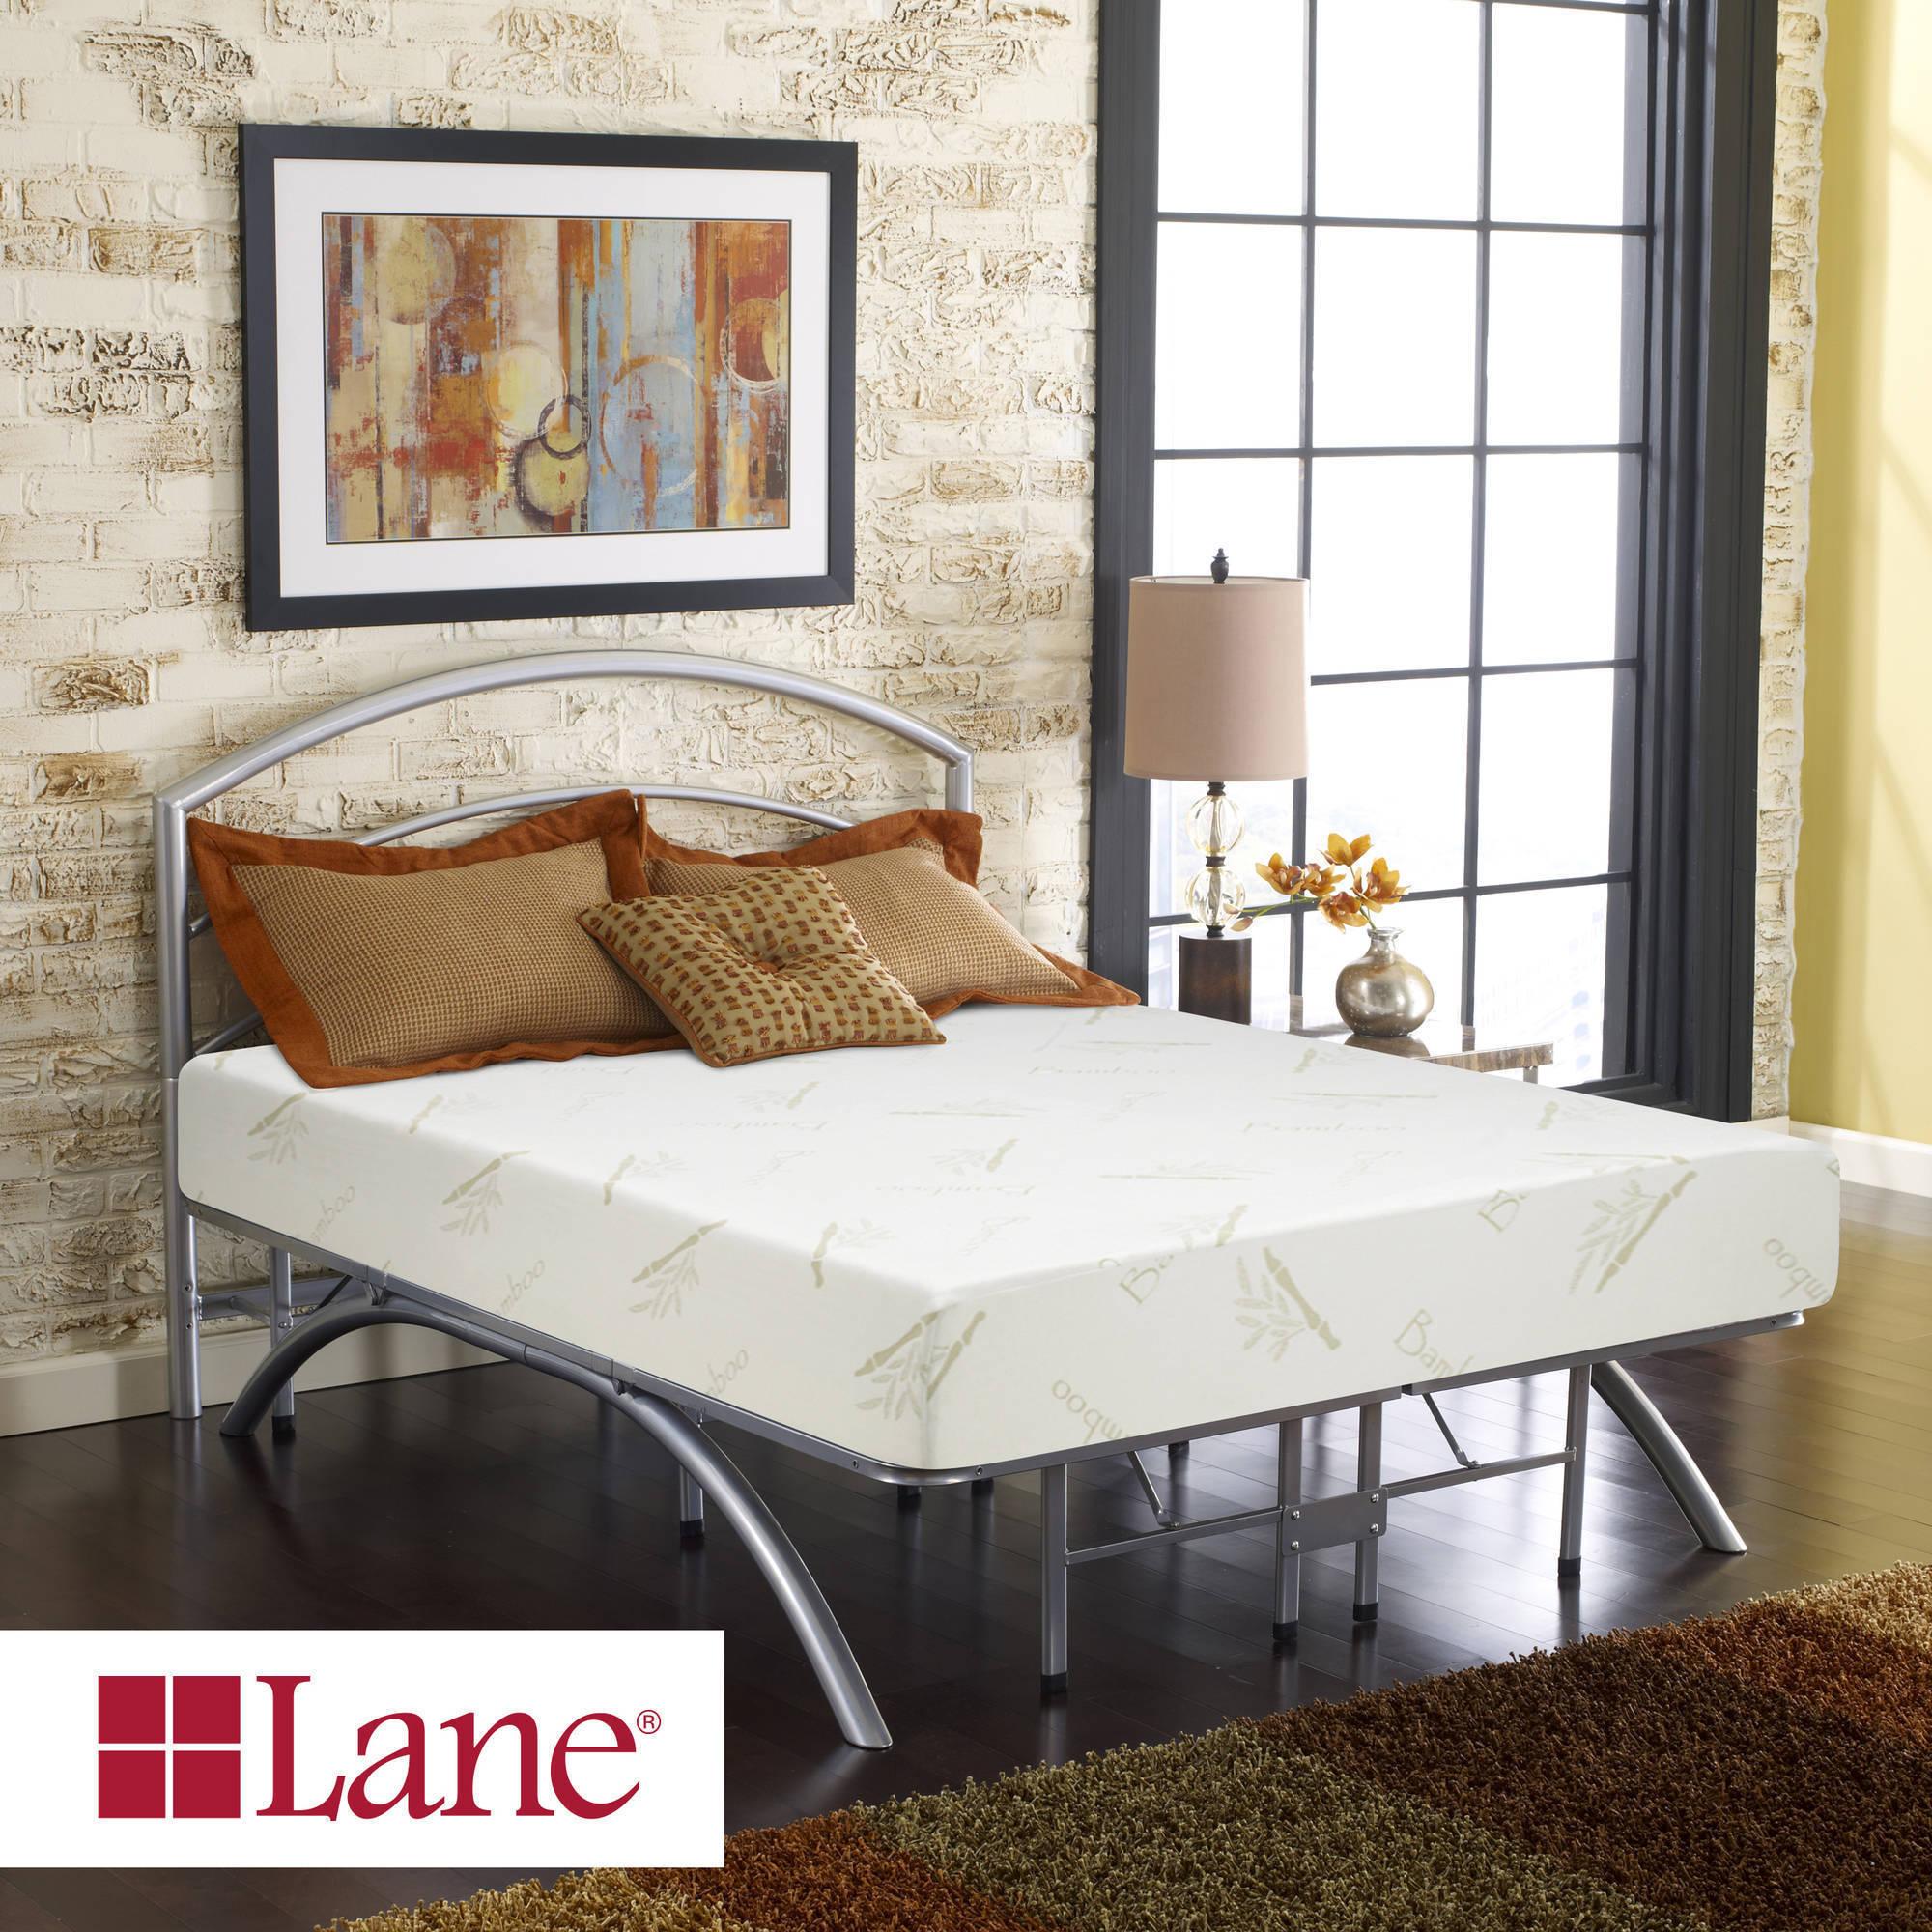 "Contura by Lane 10"" Medium Firm Plush Top Memory Foam Mattress Bed, Multiple Sizes"